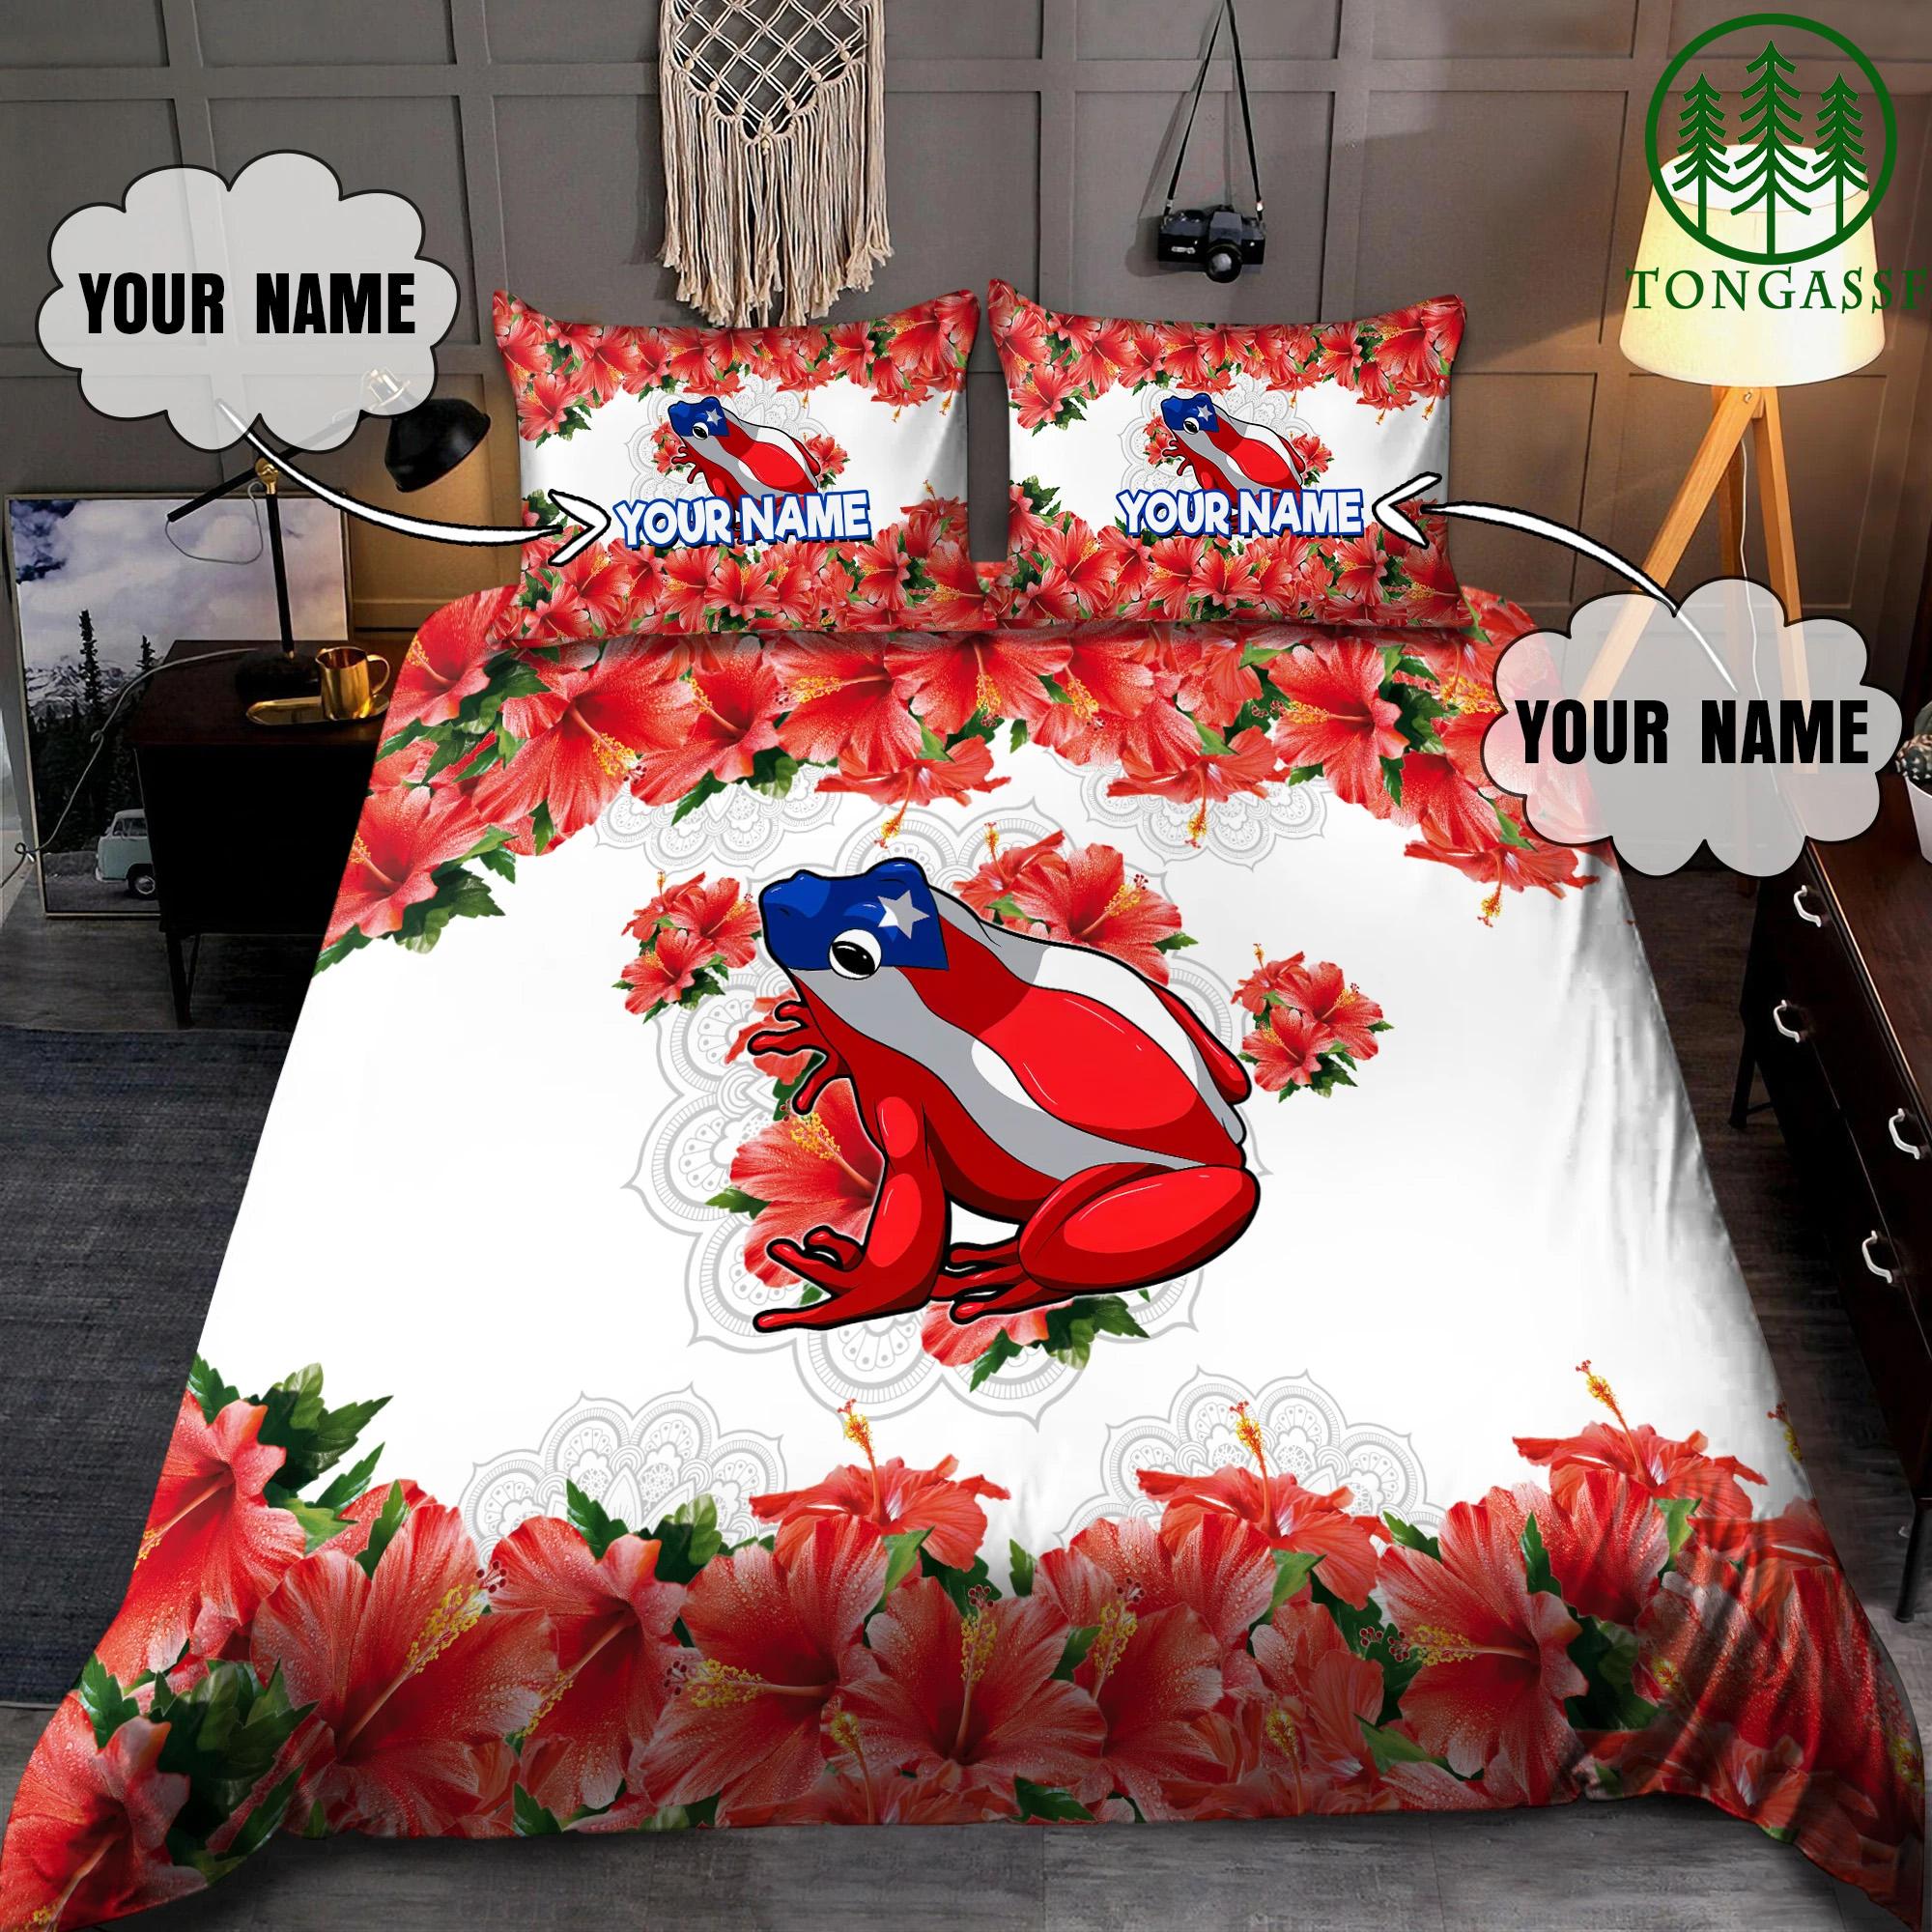 Personalized Name Coqui Puerto Rico Bedding Set